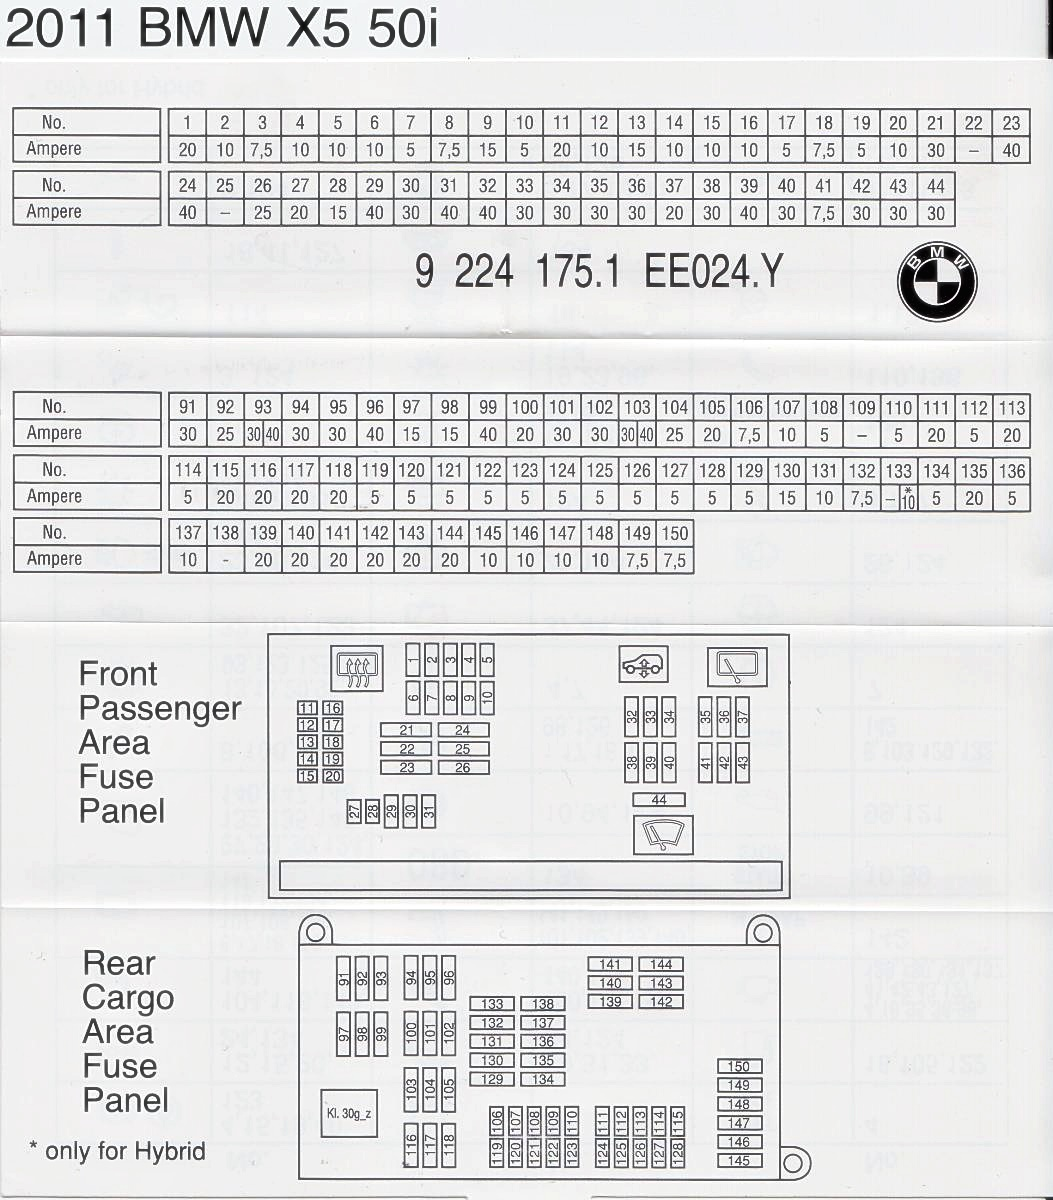 MT_8785] Bmw X5 Fuse Box Diagram Wiring DiagramGrebs Gue45 Weasi Semec Hete Reda Inrebe Trons Mohammedshrine Librar Wiring  101